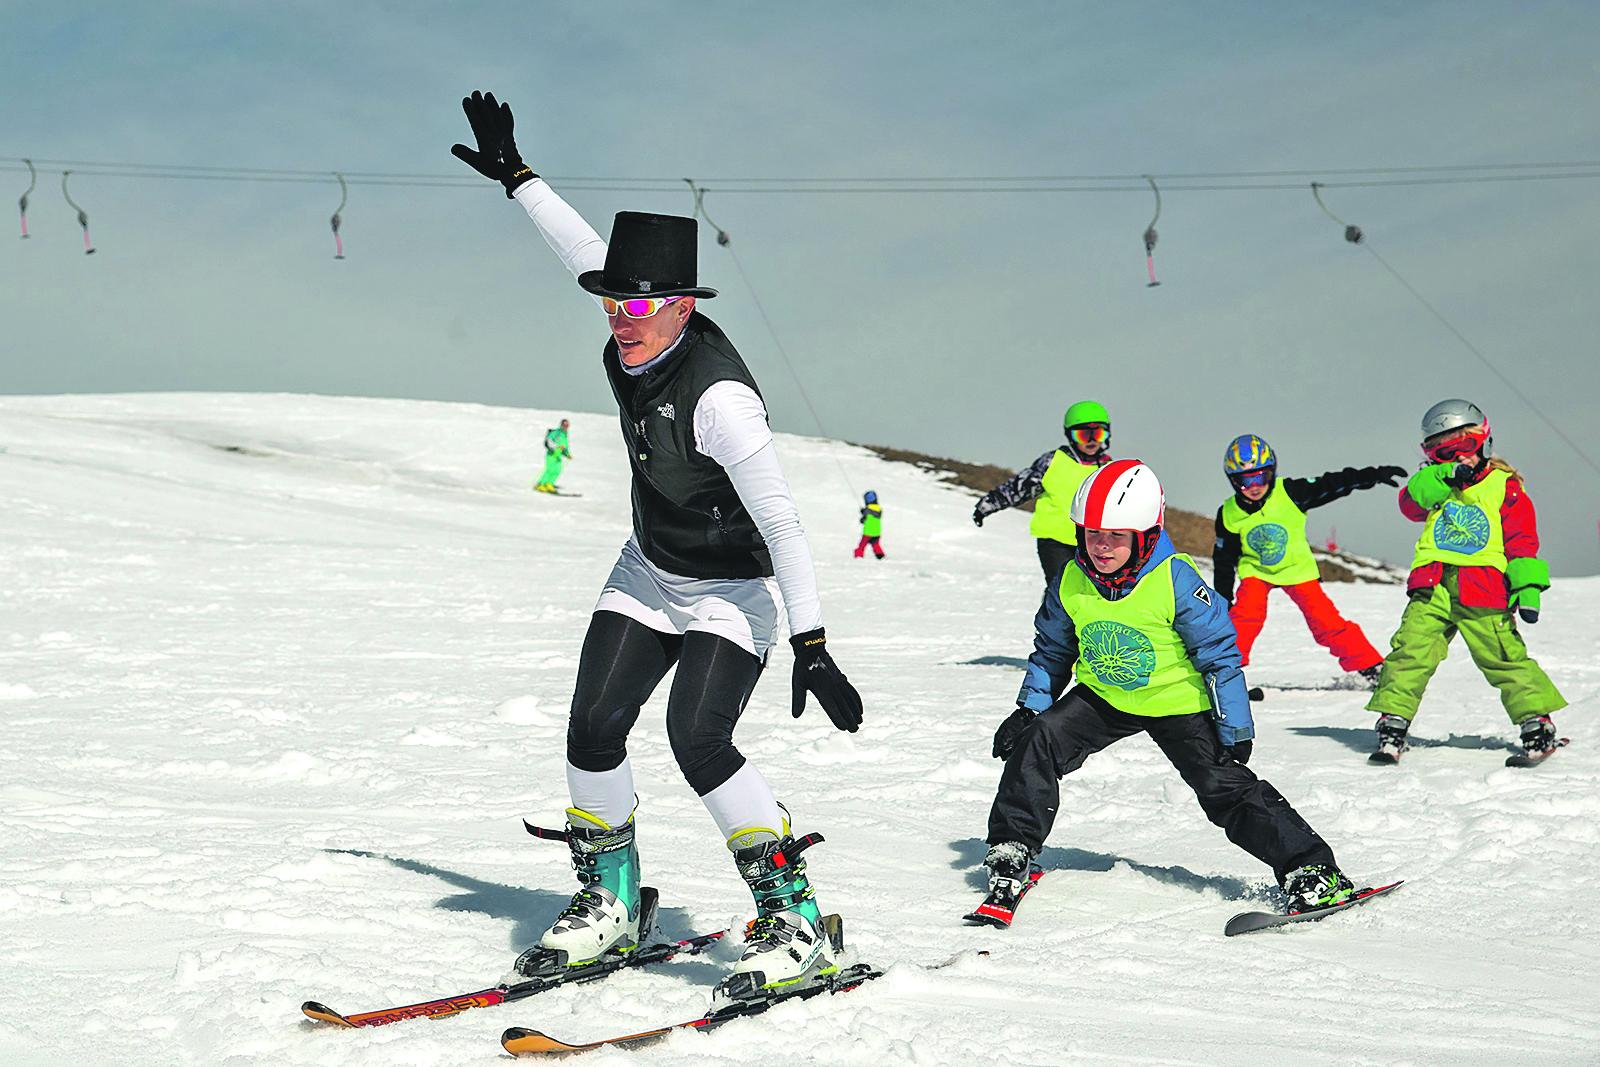 Villach, Austrija, 030319. Ski patrola sa skijalista Gerlitzen i Dreilandereck Arnoldstein kod grada Villach u Koruskoj. Na fotografiji: skijaliste Dreilandereck Arnoldstein  Foto: Tom Dubravec/ CROPIX